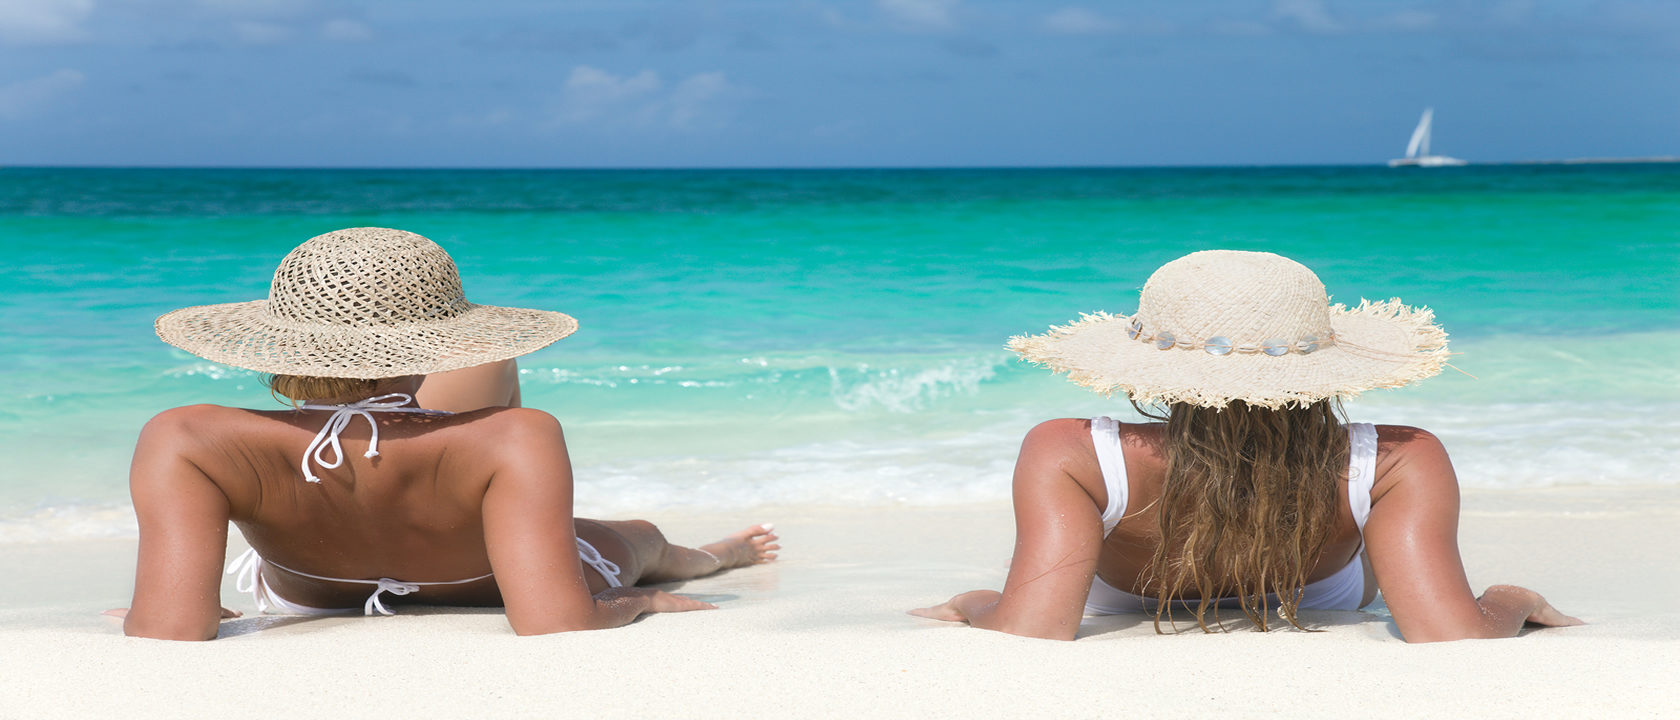 Lesbian_Travel_Beach_Hats